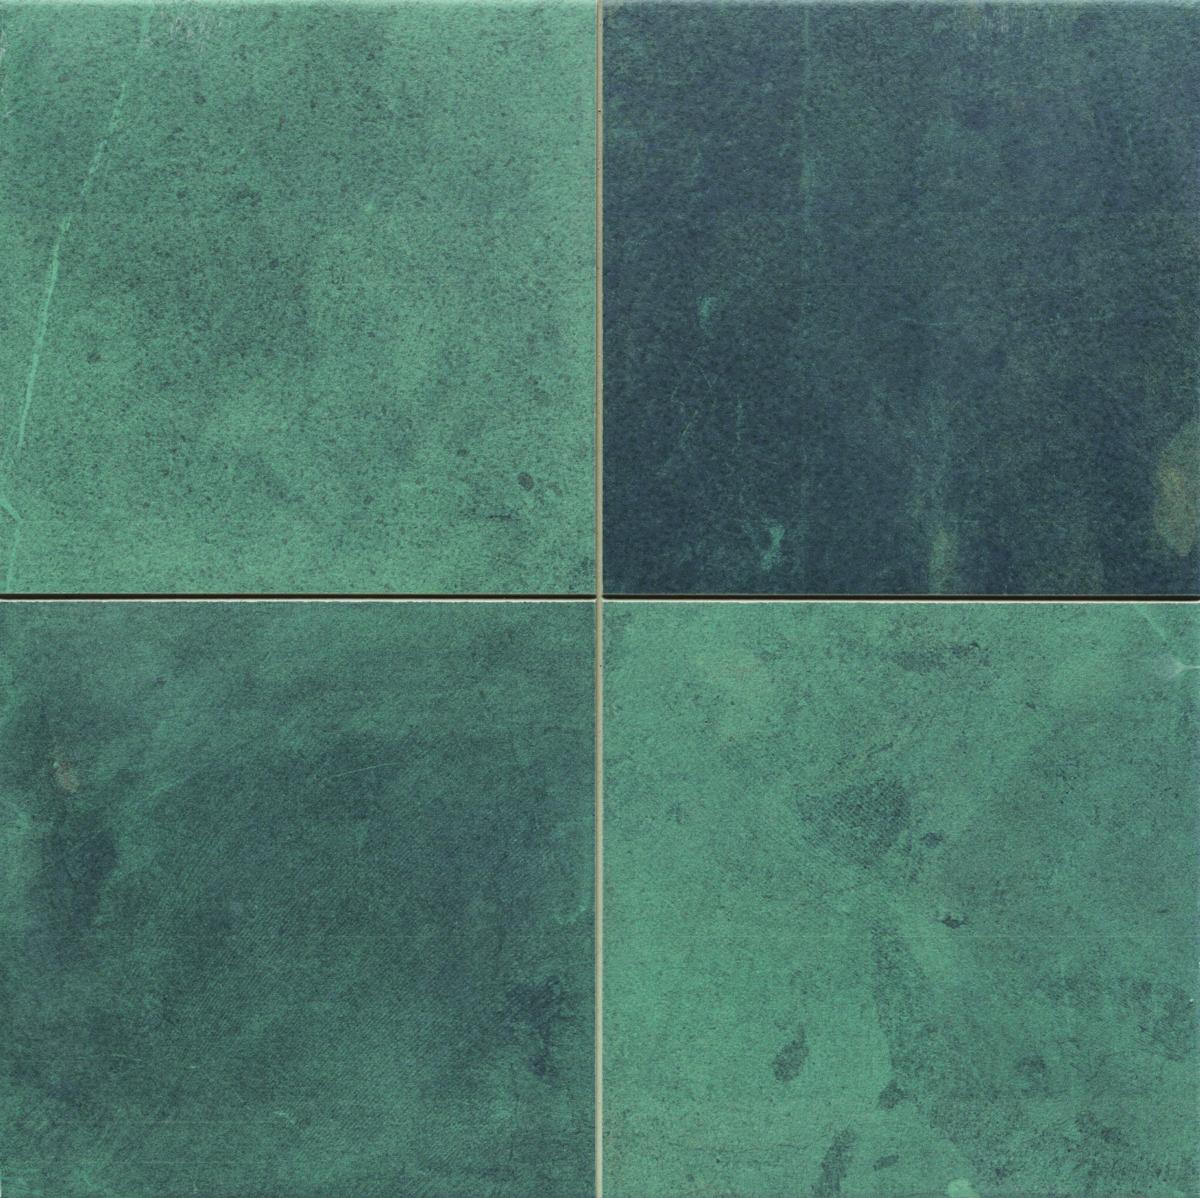 Realonda Bali Verde 333x333mm_Stiles_Product1_Image